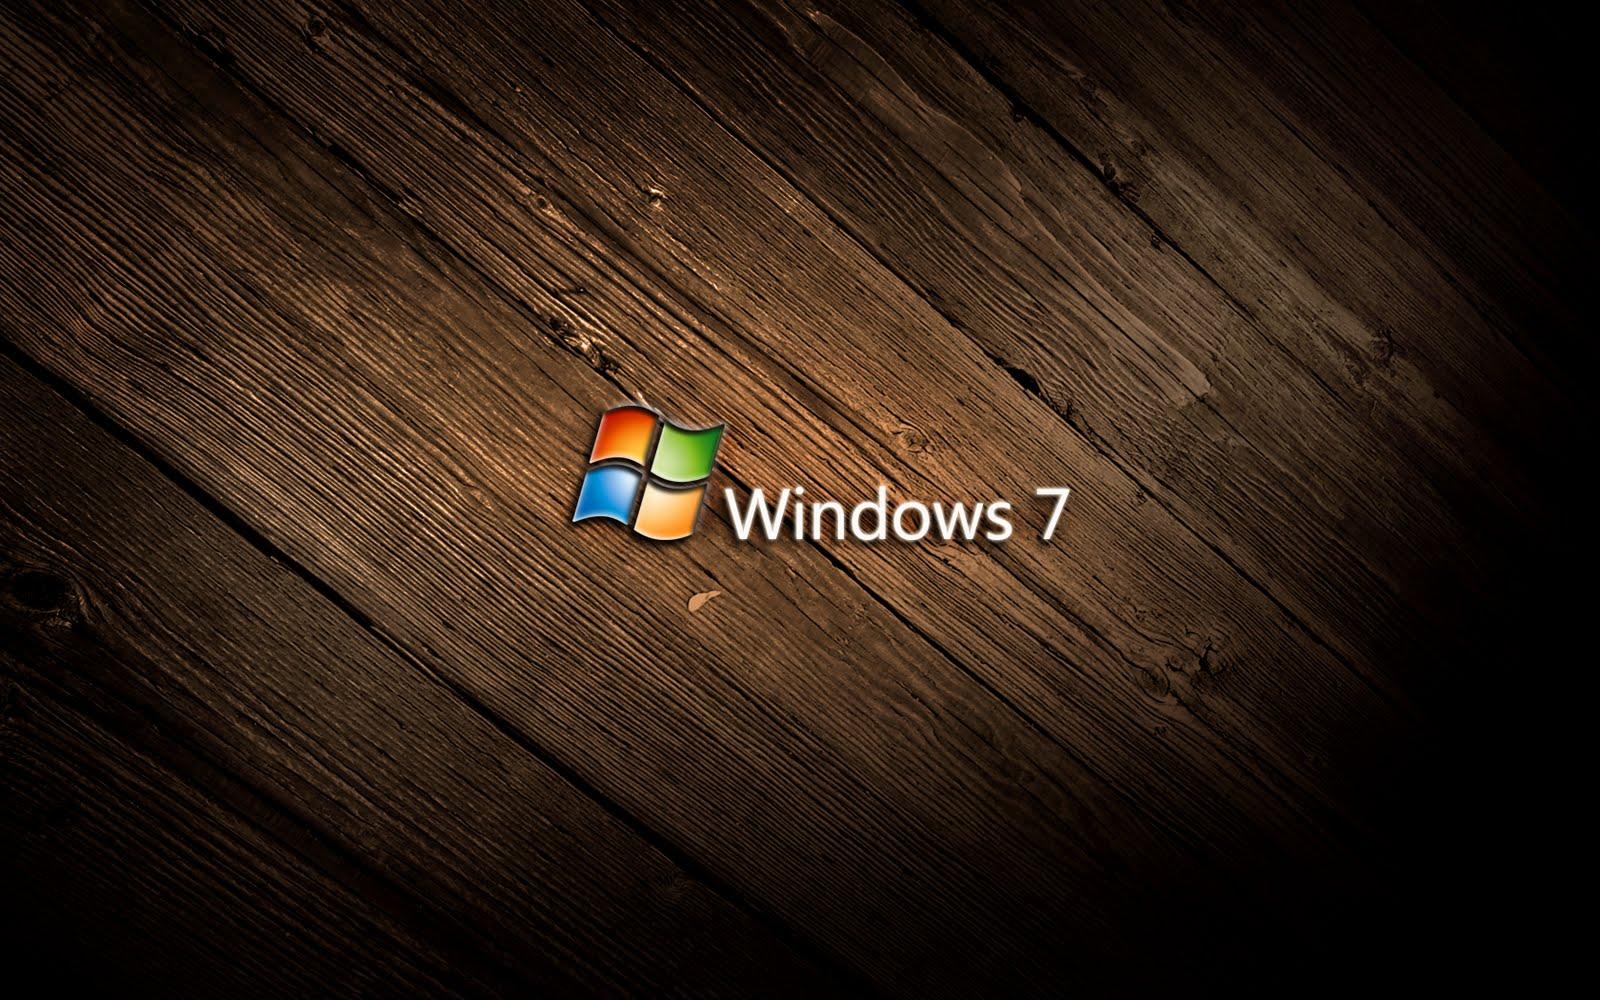 trololo blogg: Windows 7 Hd Wallpaper 1920x1080